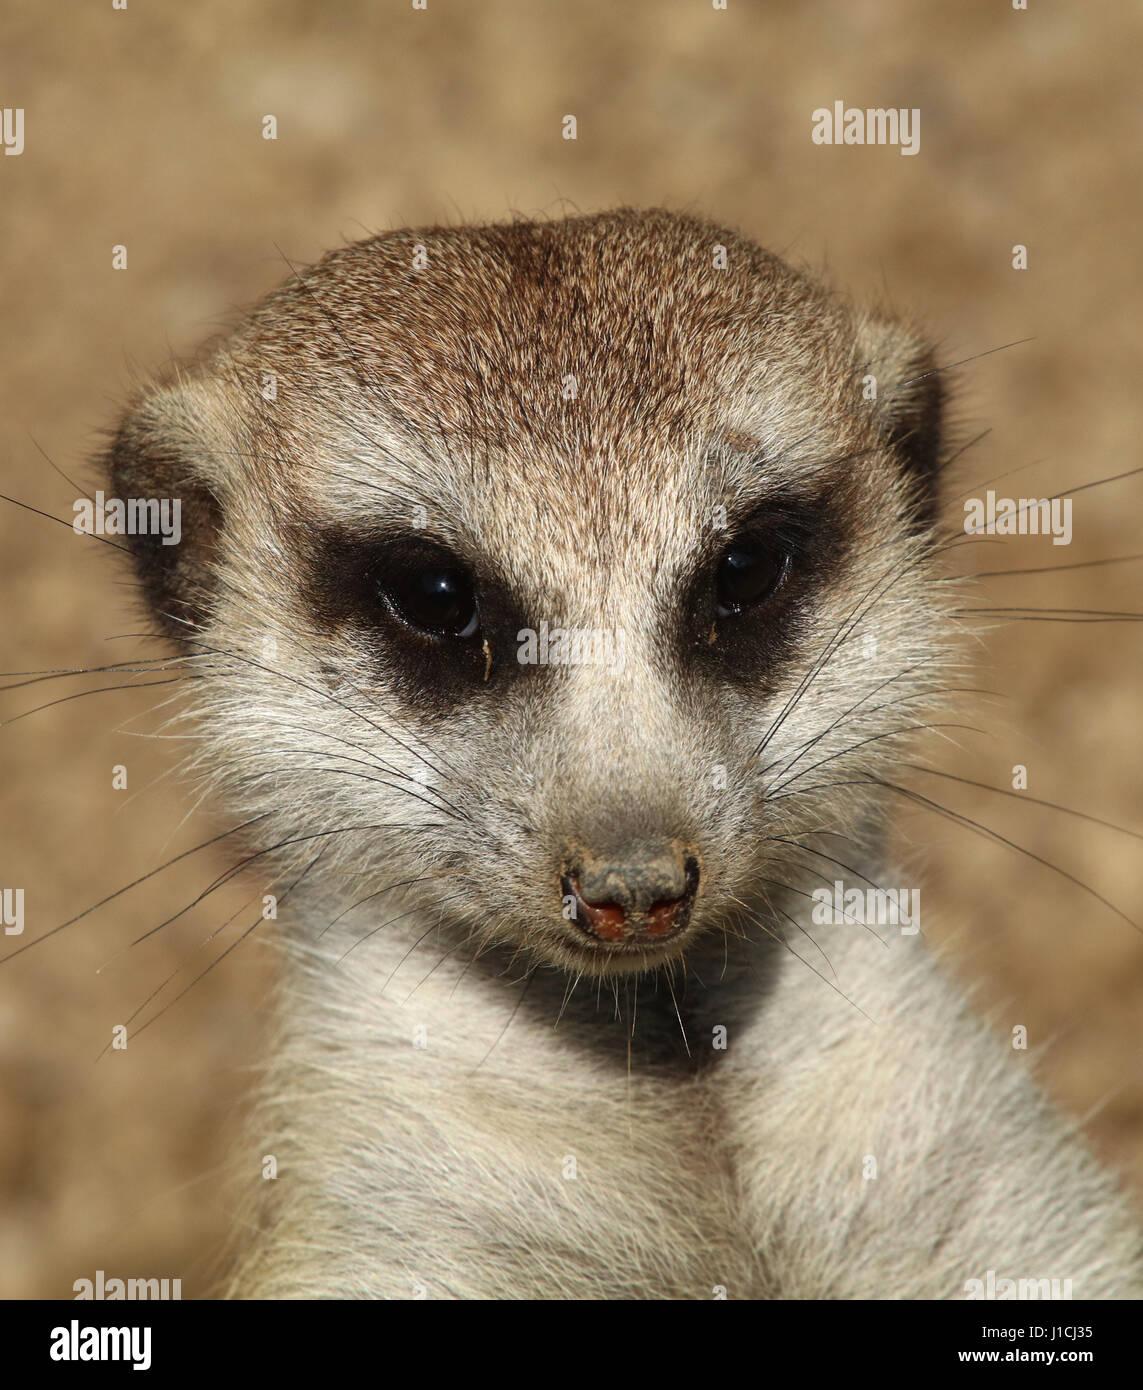 meerkat or suricate (Suricata suricatta) at Cincinnati zoo Face close up - Stock Image